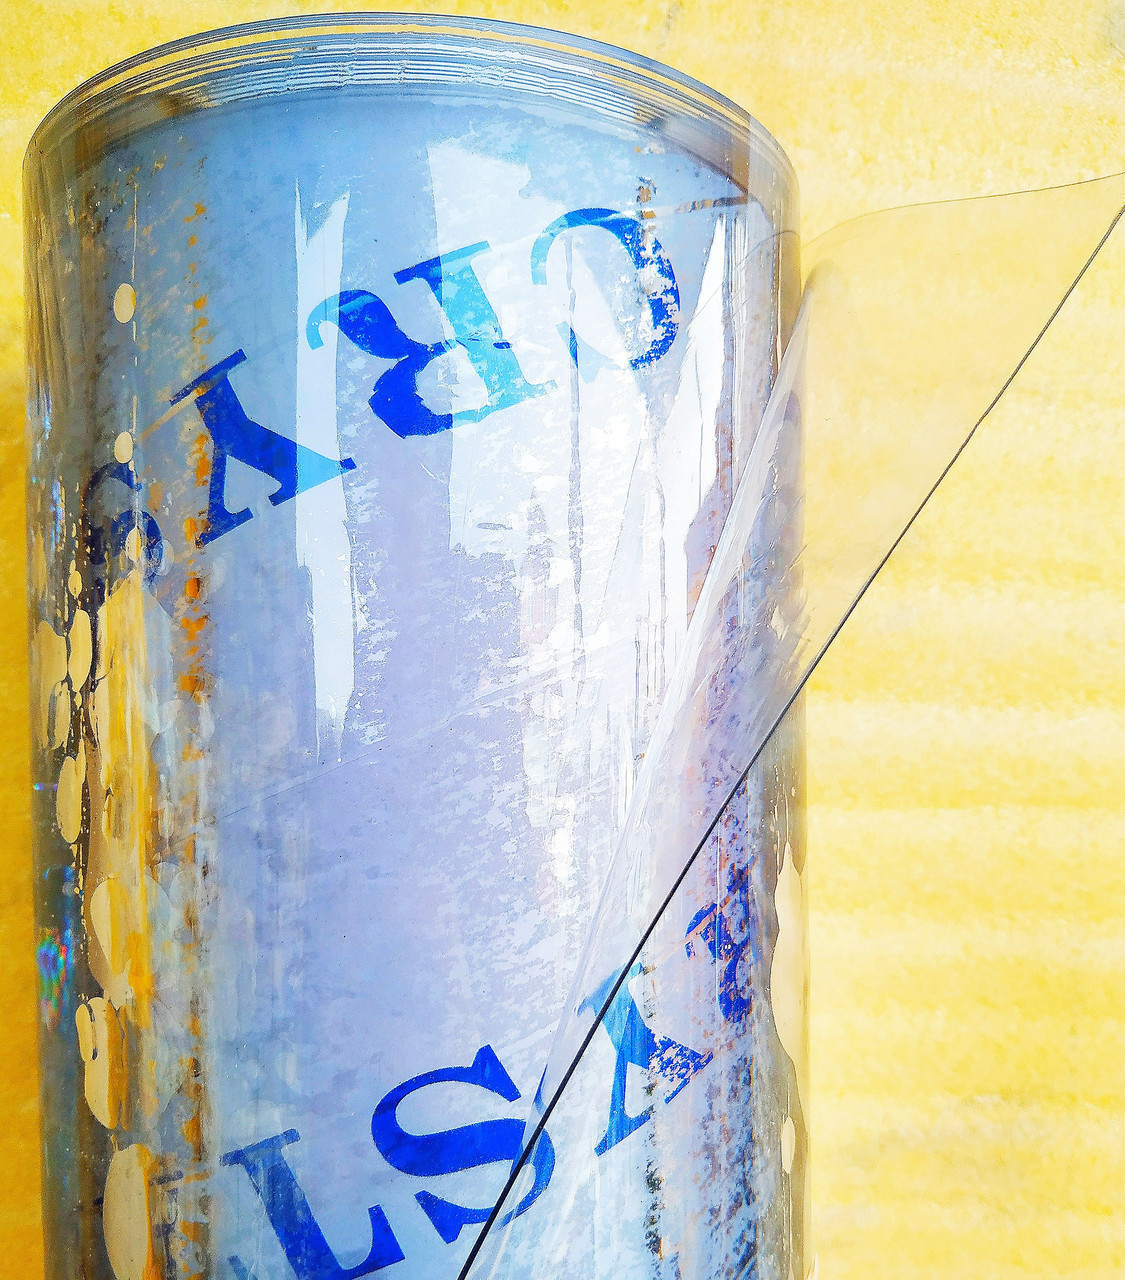 Пленка ПВХ Гибкое стекло. 1000 мкм (1мм) плотность. Ширина 140см. Рулон 15м. Прозрачная. Crystal